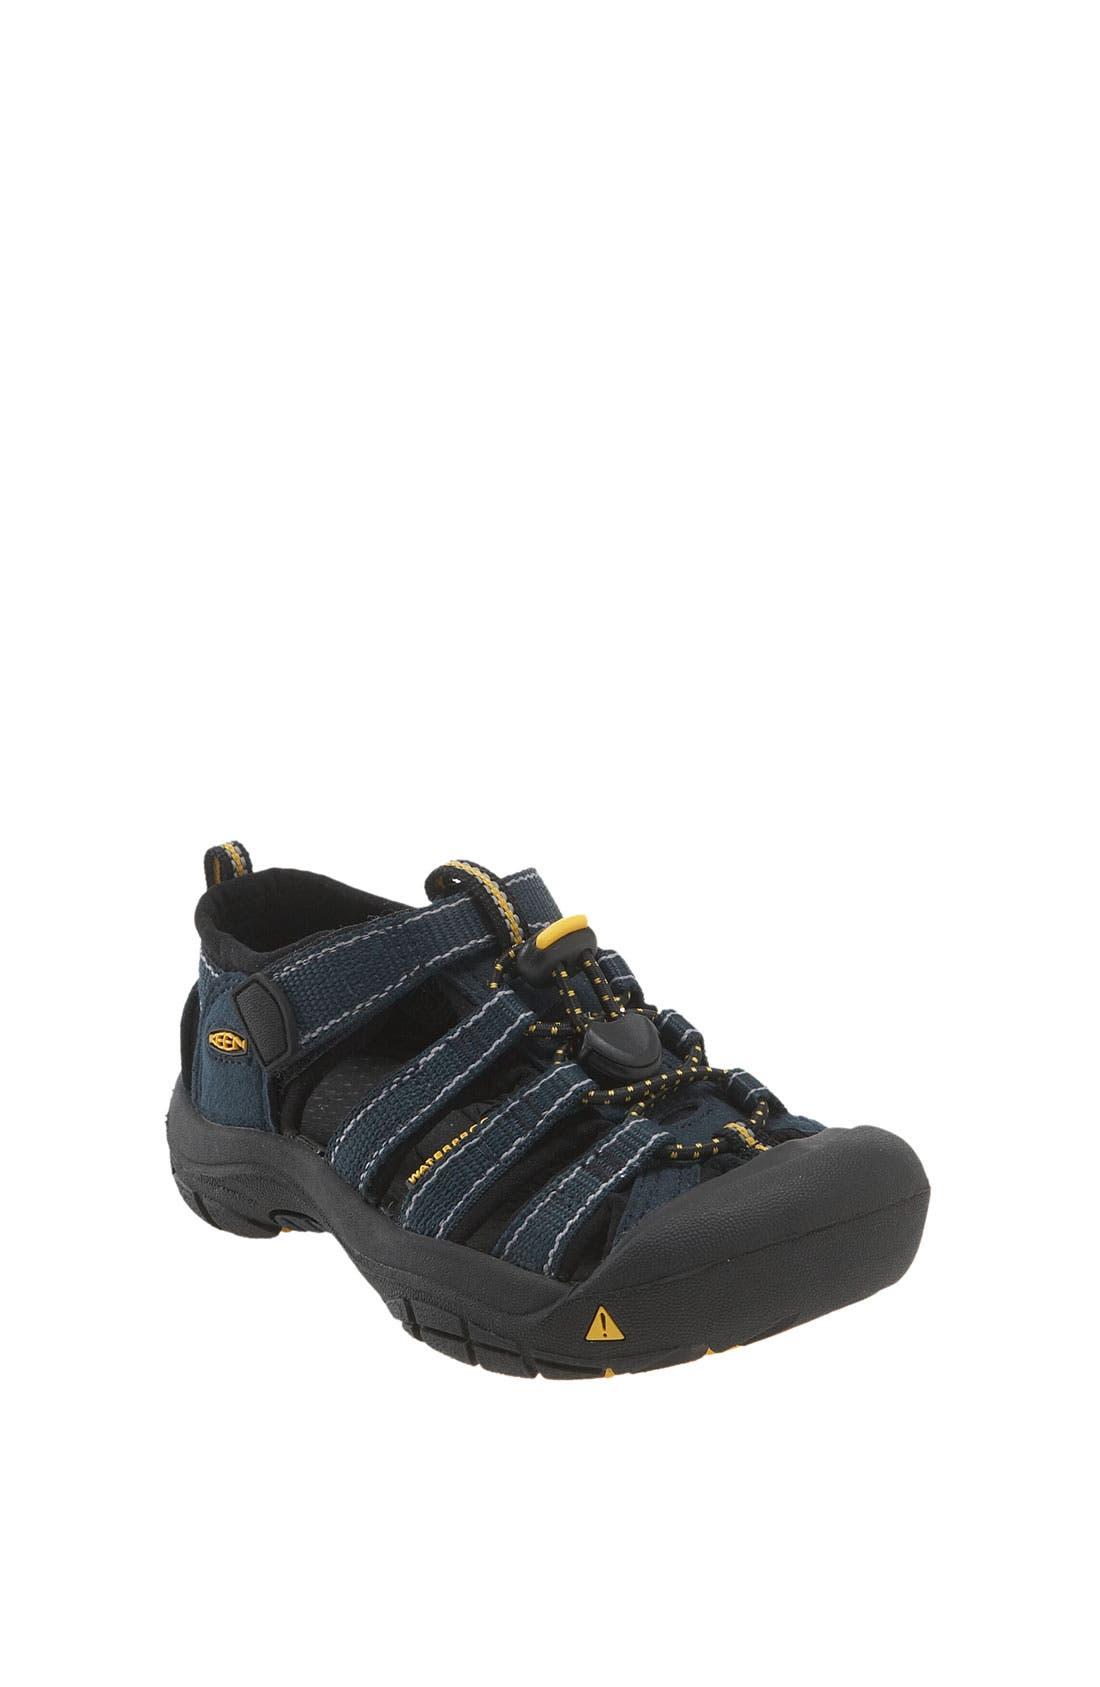 Main Image - Keen 'Newport H2' Waterproof Sandal (Toddler, Little Kid & Big Kid)